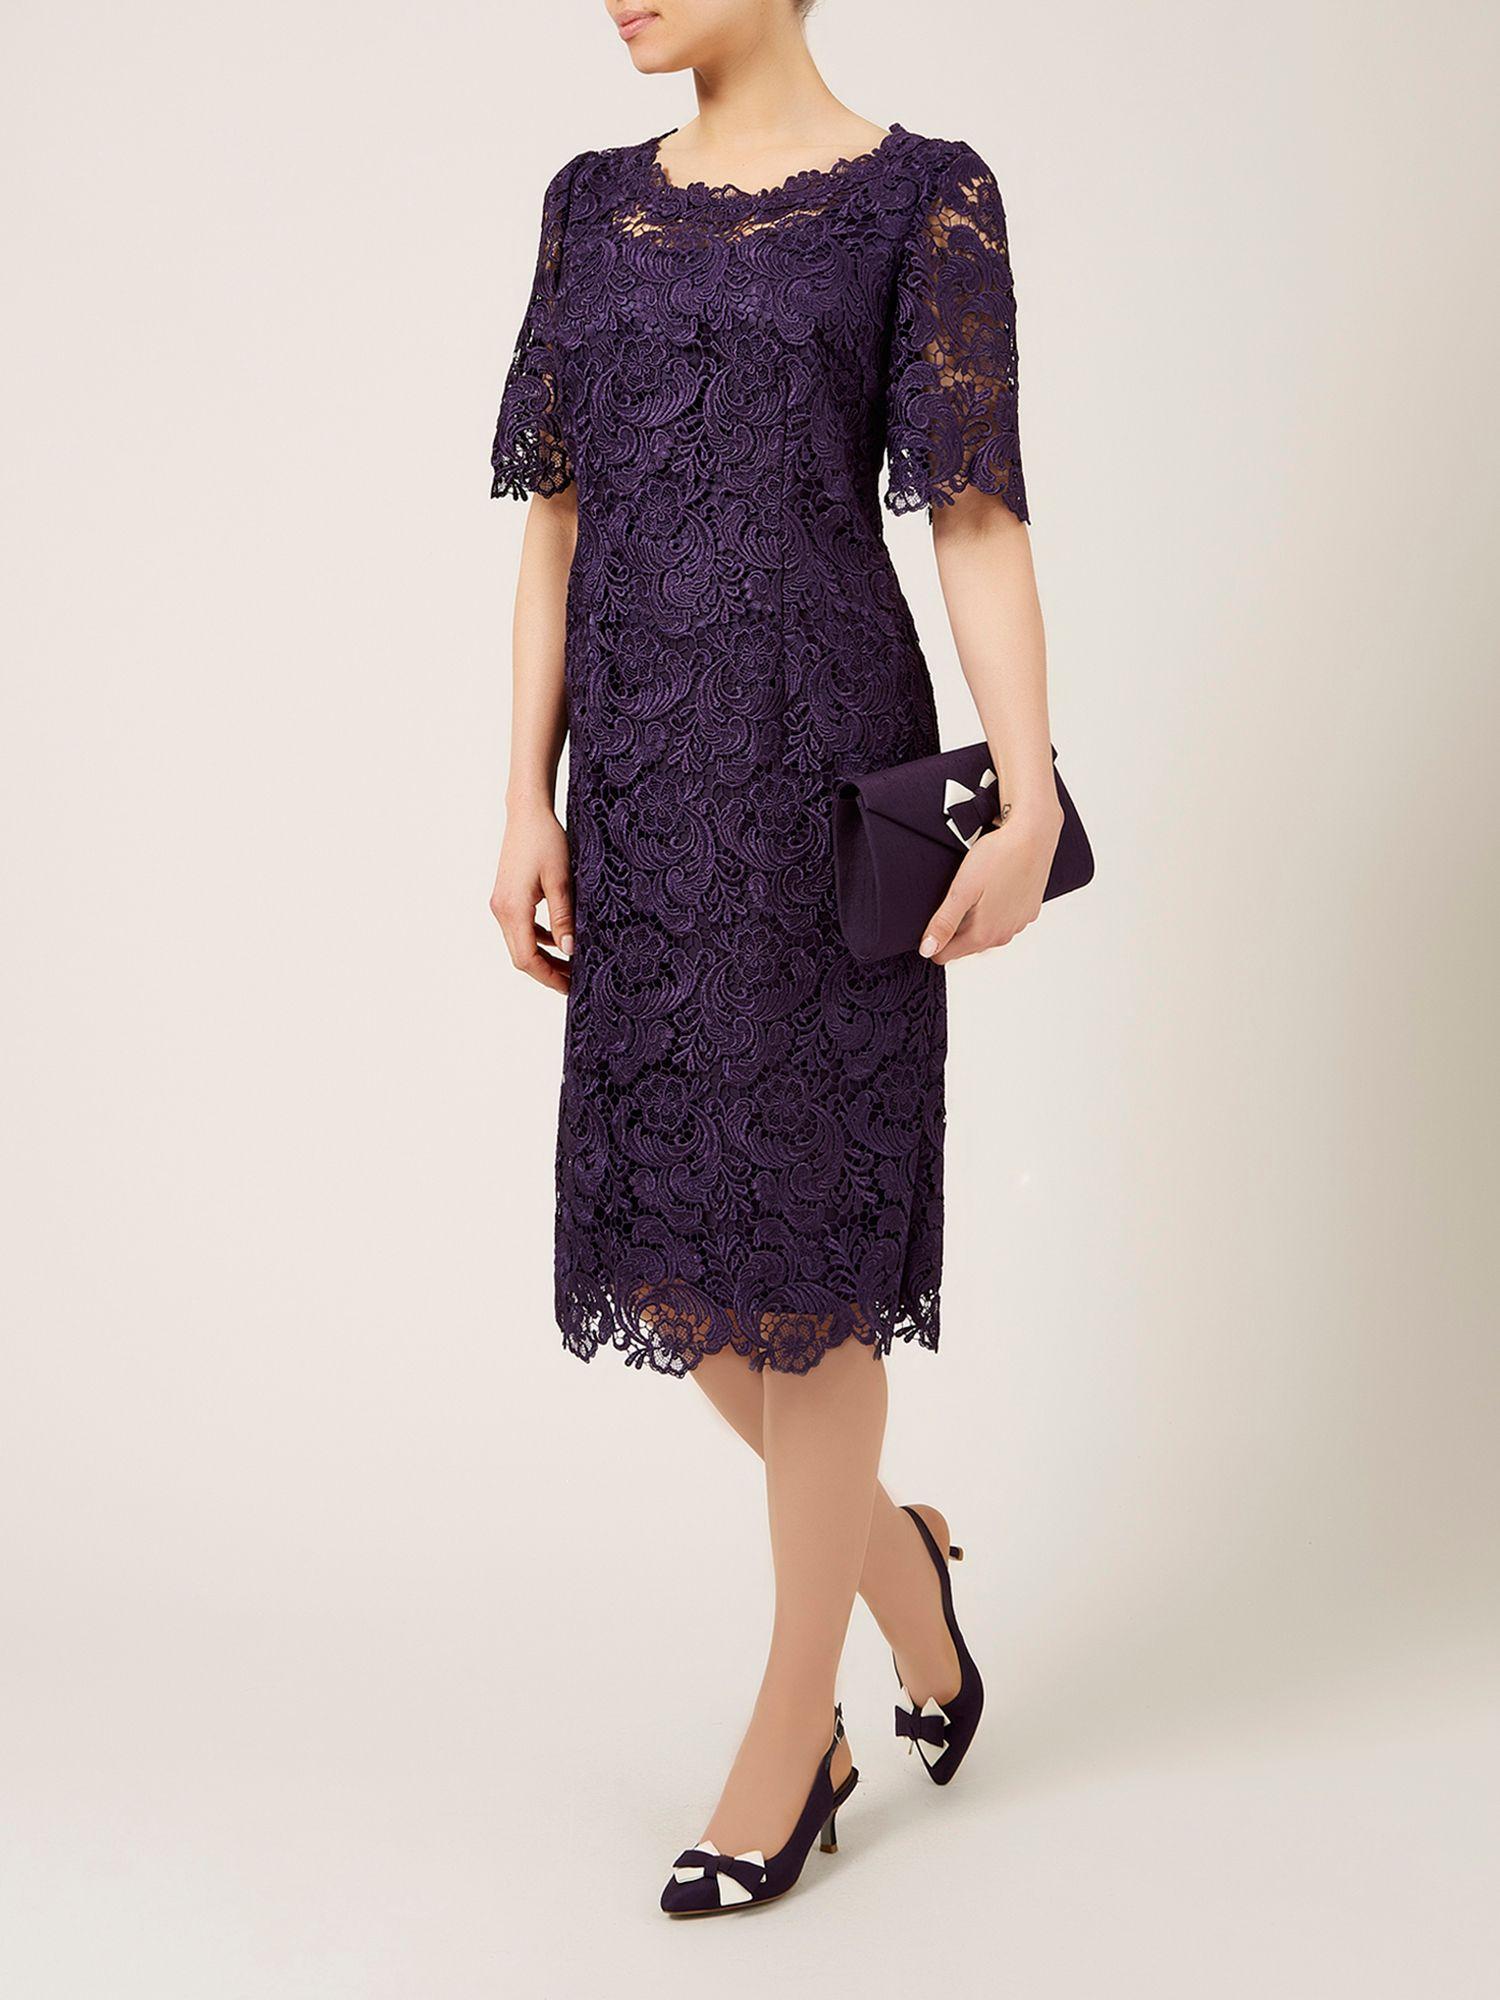 lyst jacques vert luxury lace dress in purple